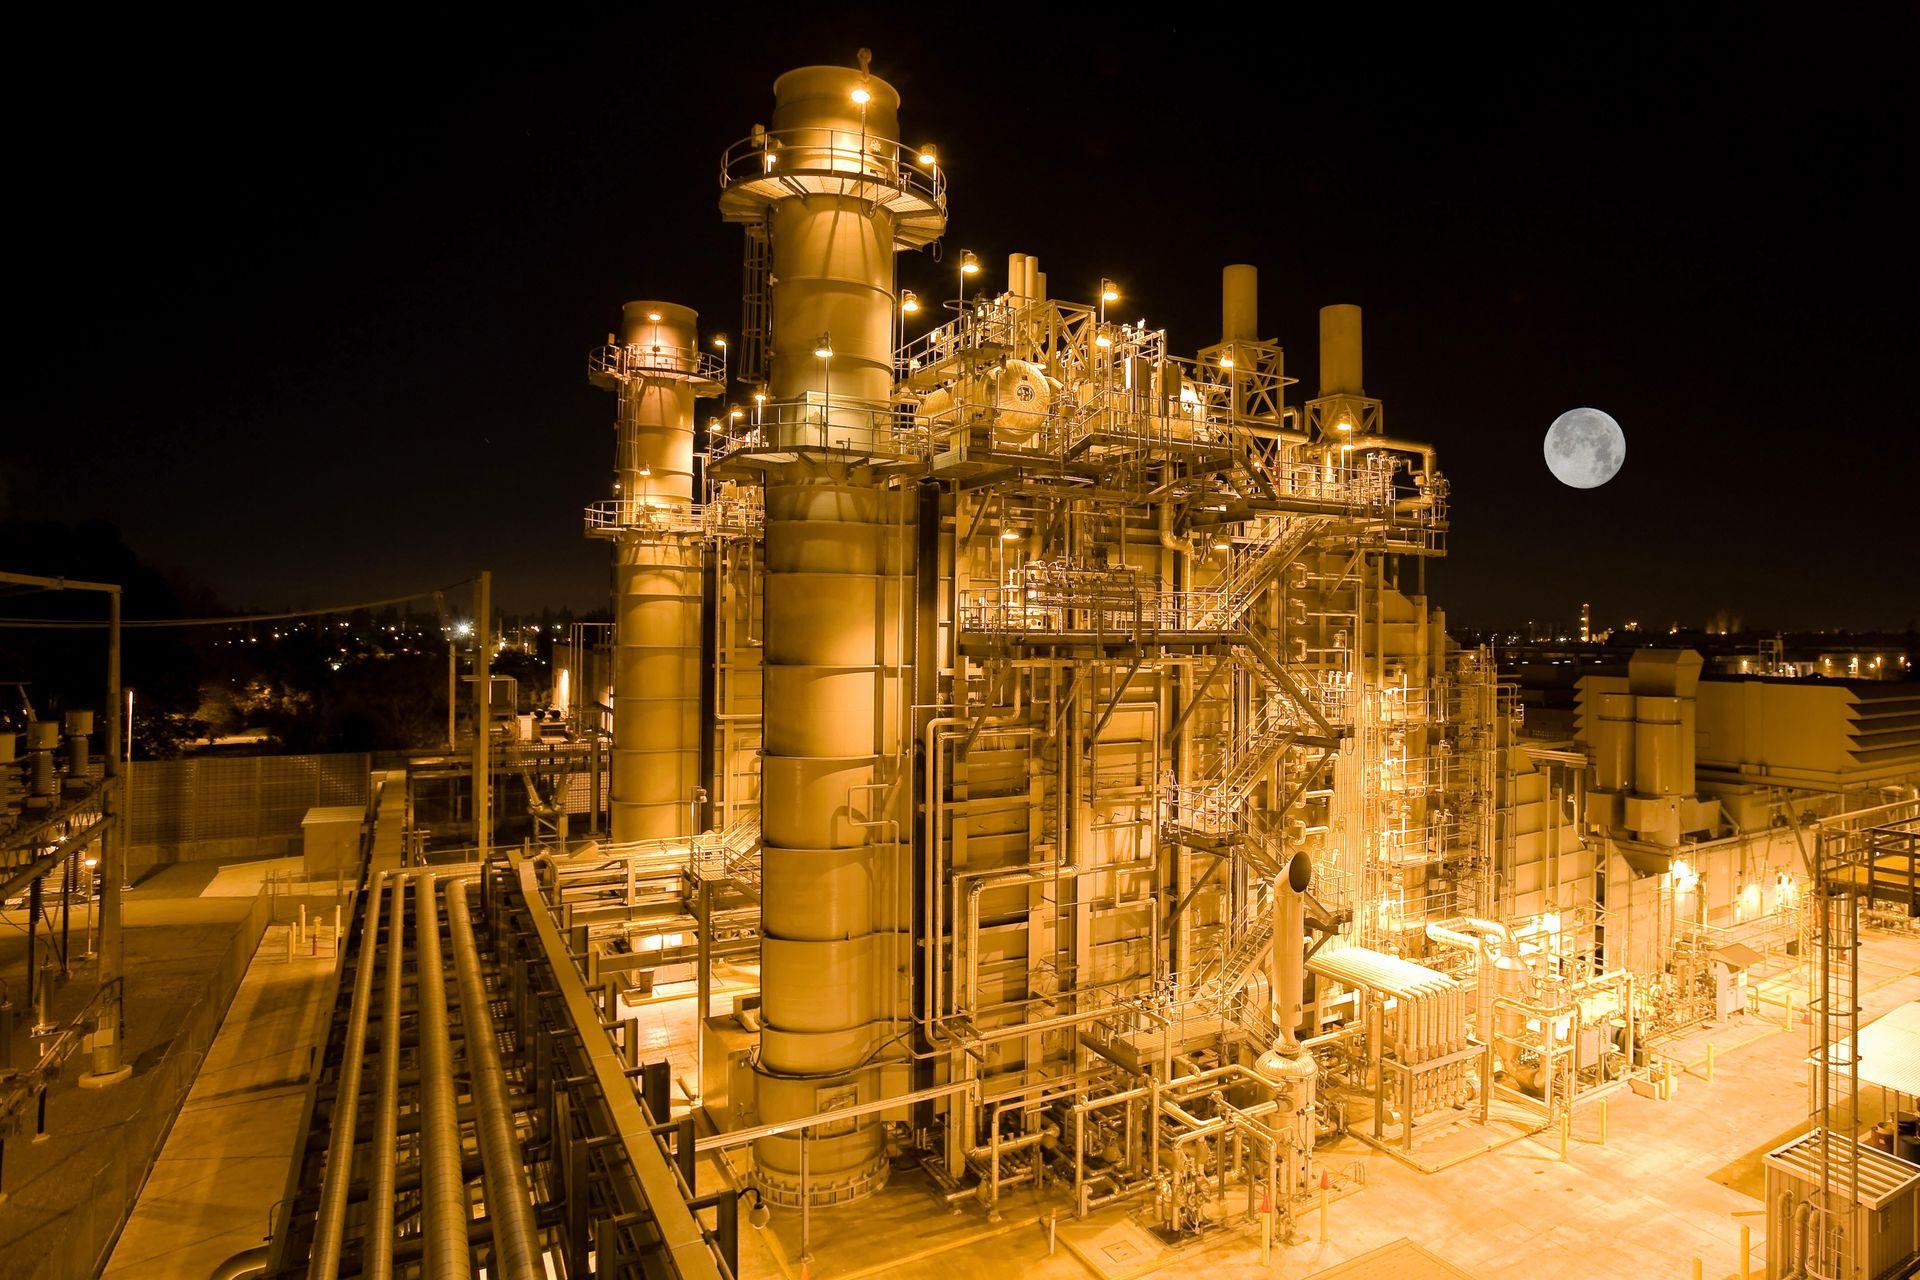 Ukraїnśka kompanija vperše eksportuvala gaz do Jevropy